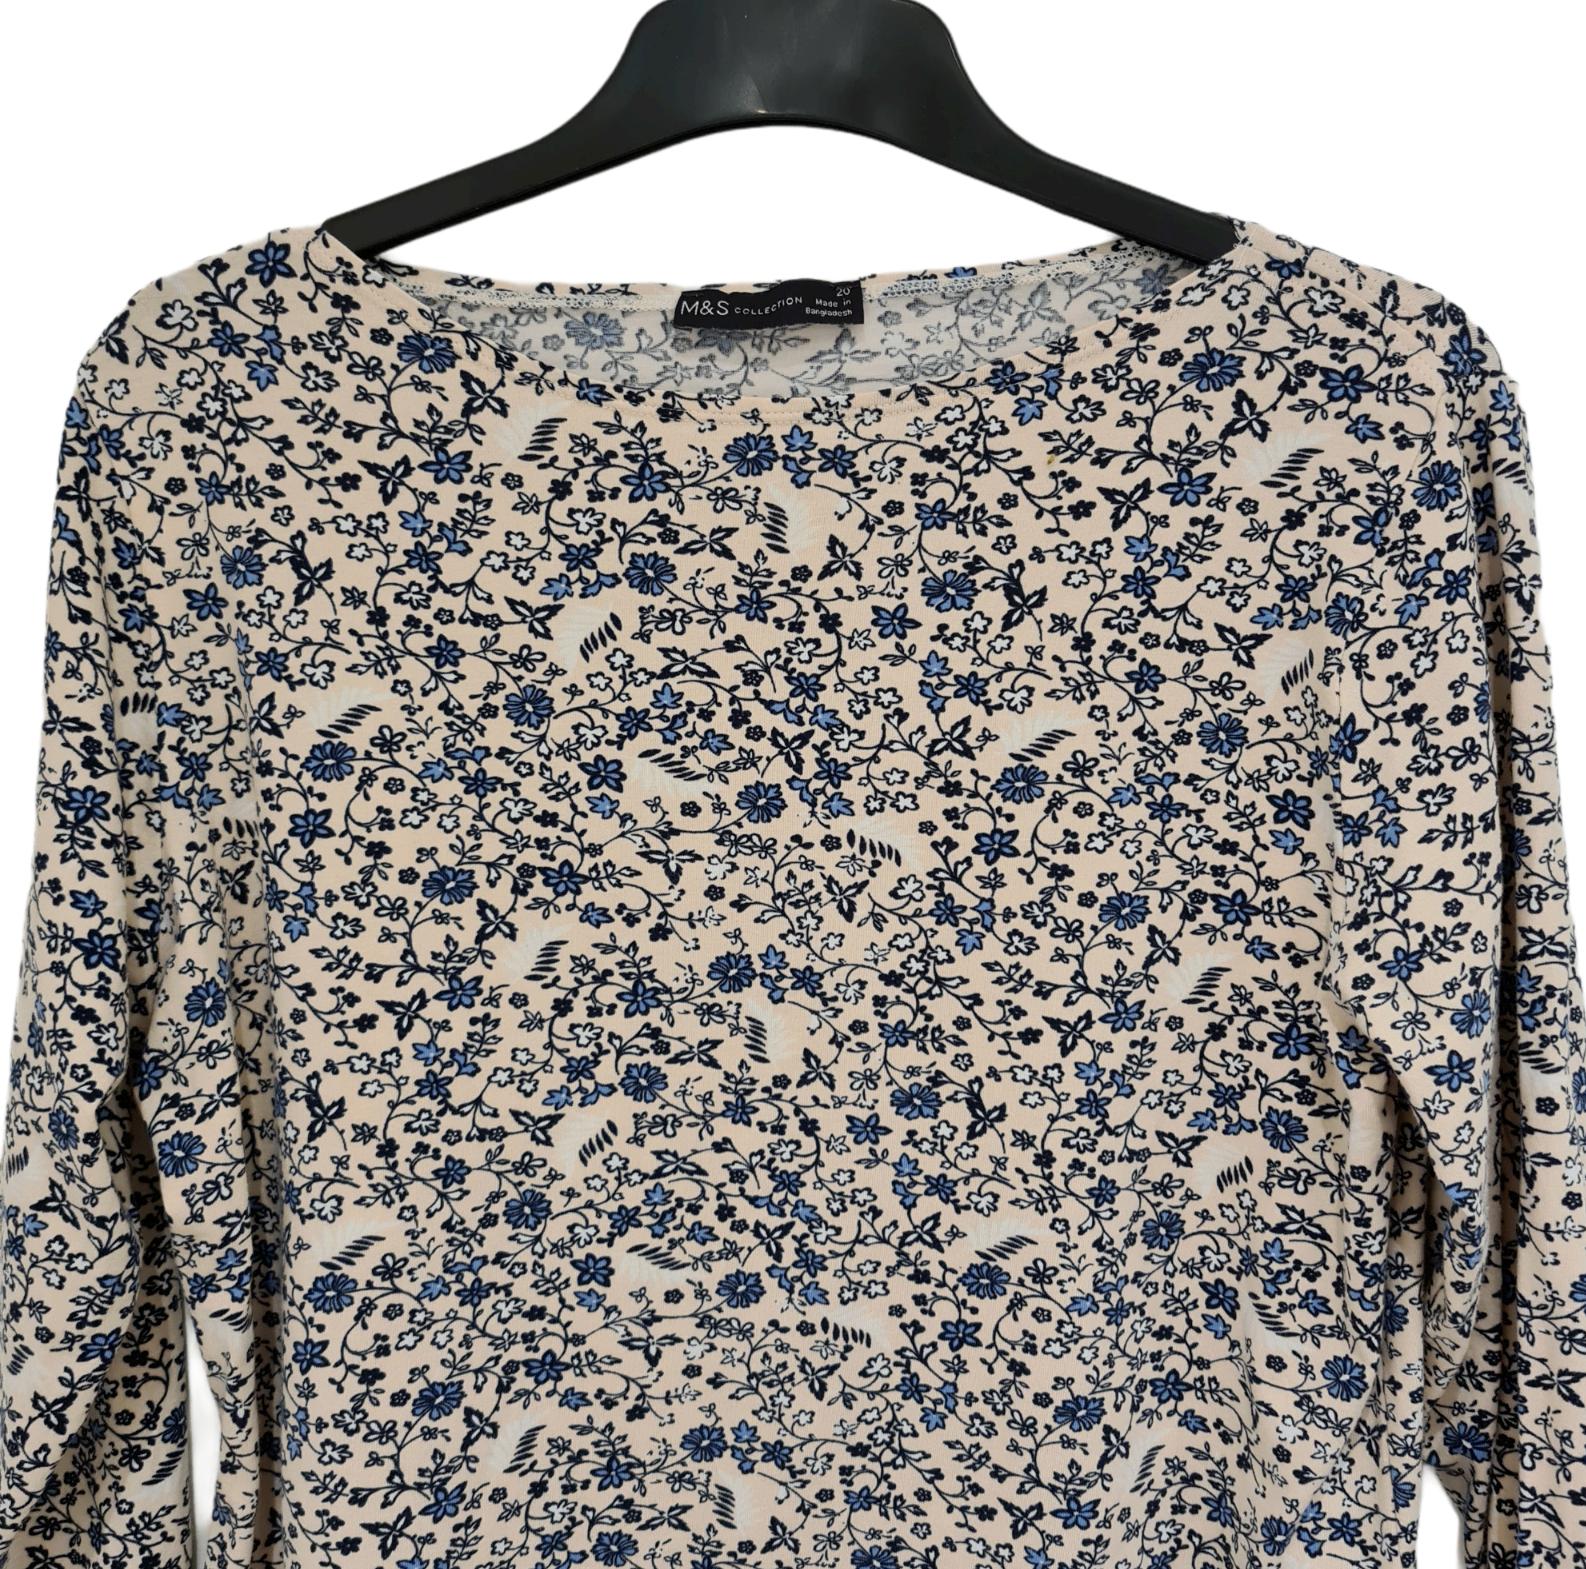 Marks and Spencer Top Size 20 Cream Blue Floral Design Elastane for Stretch.